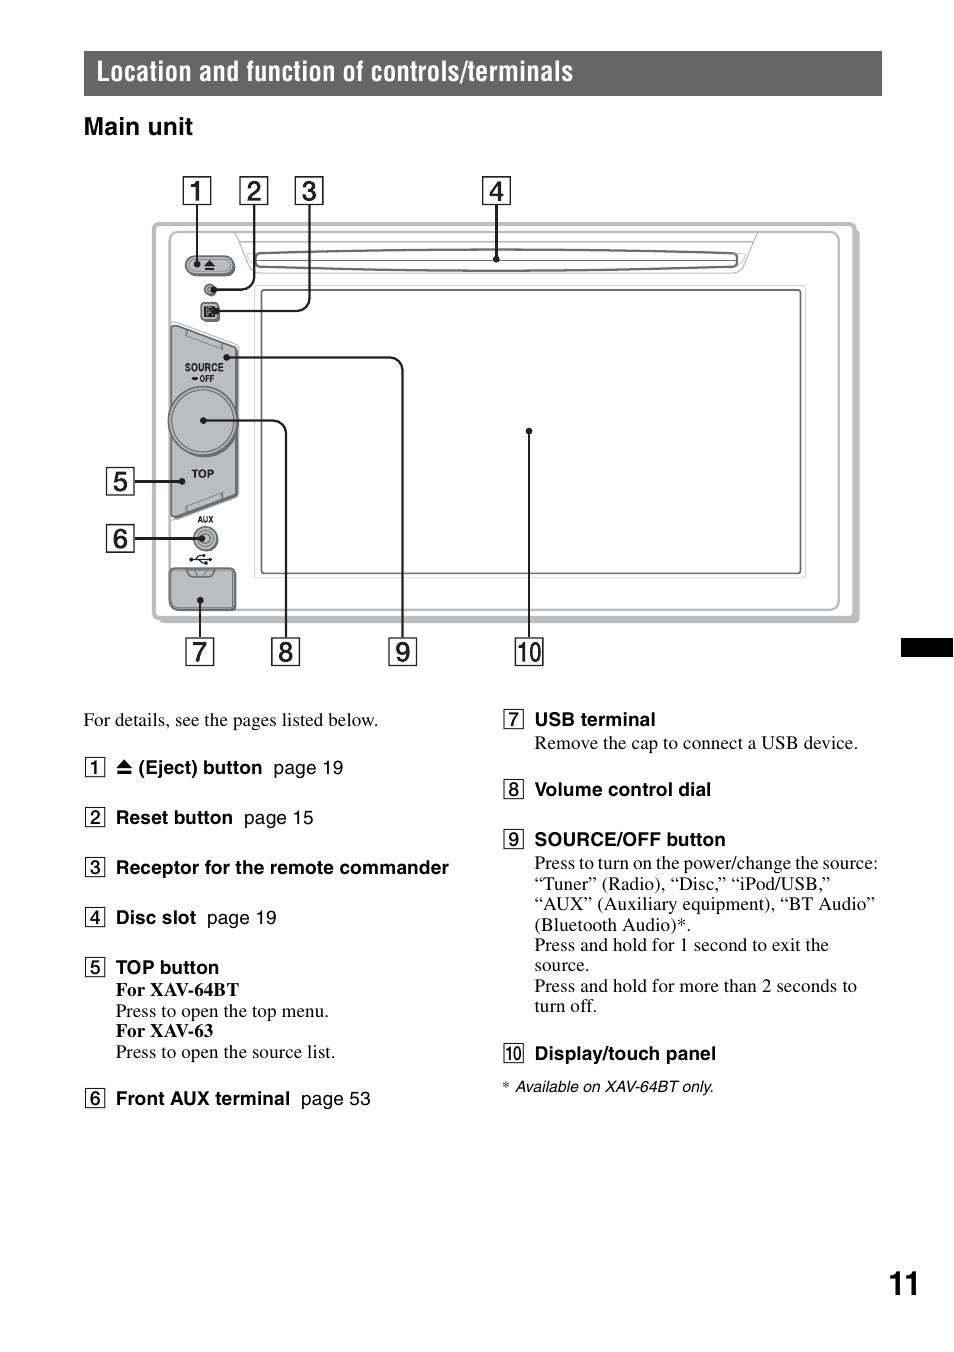 Sony xav-63 user manual | 2 pages | original mode | also for: xav-64bt.